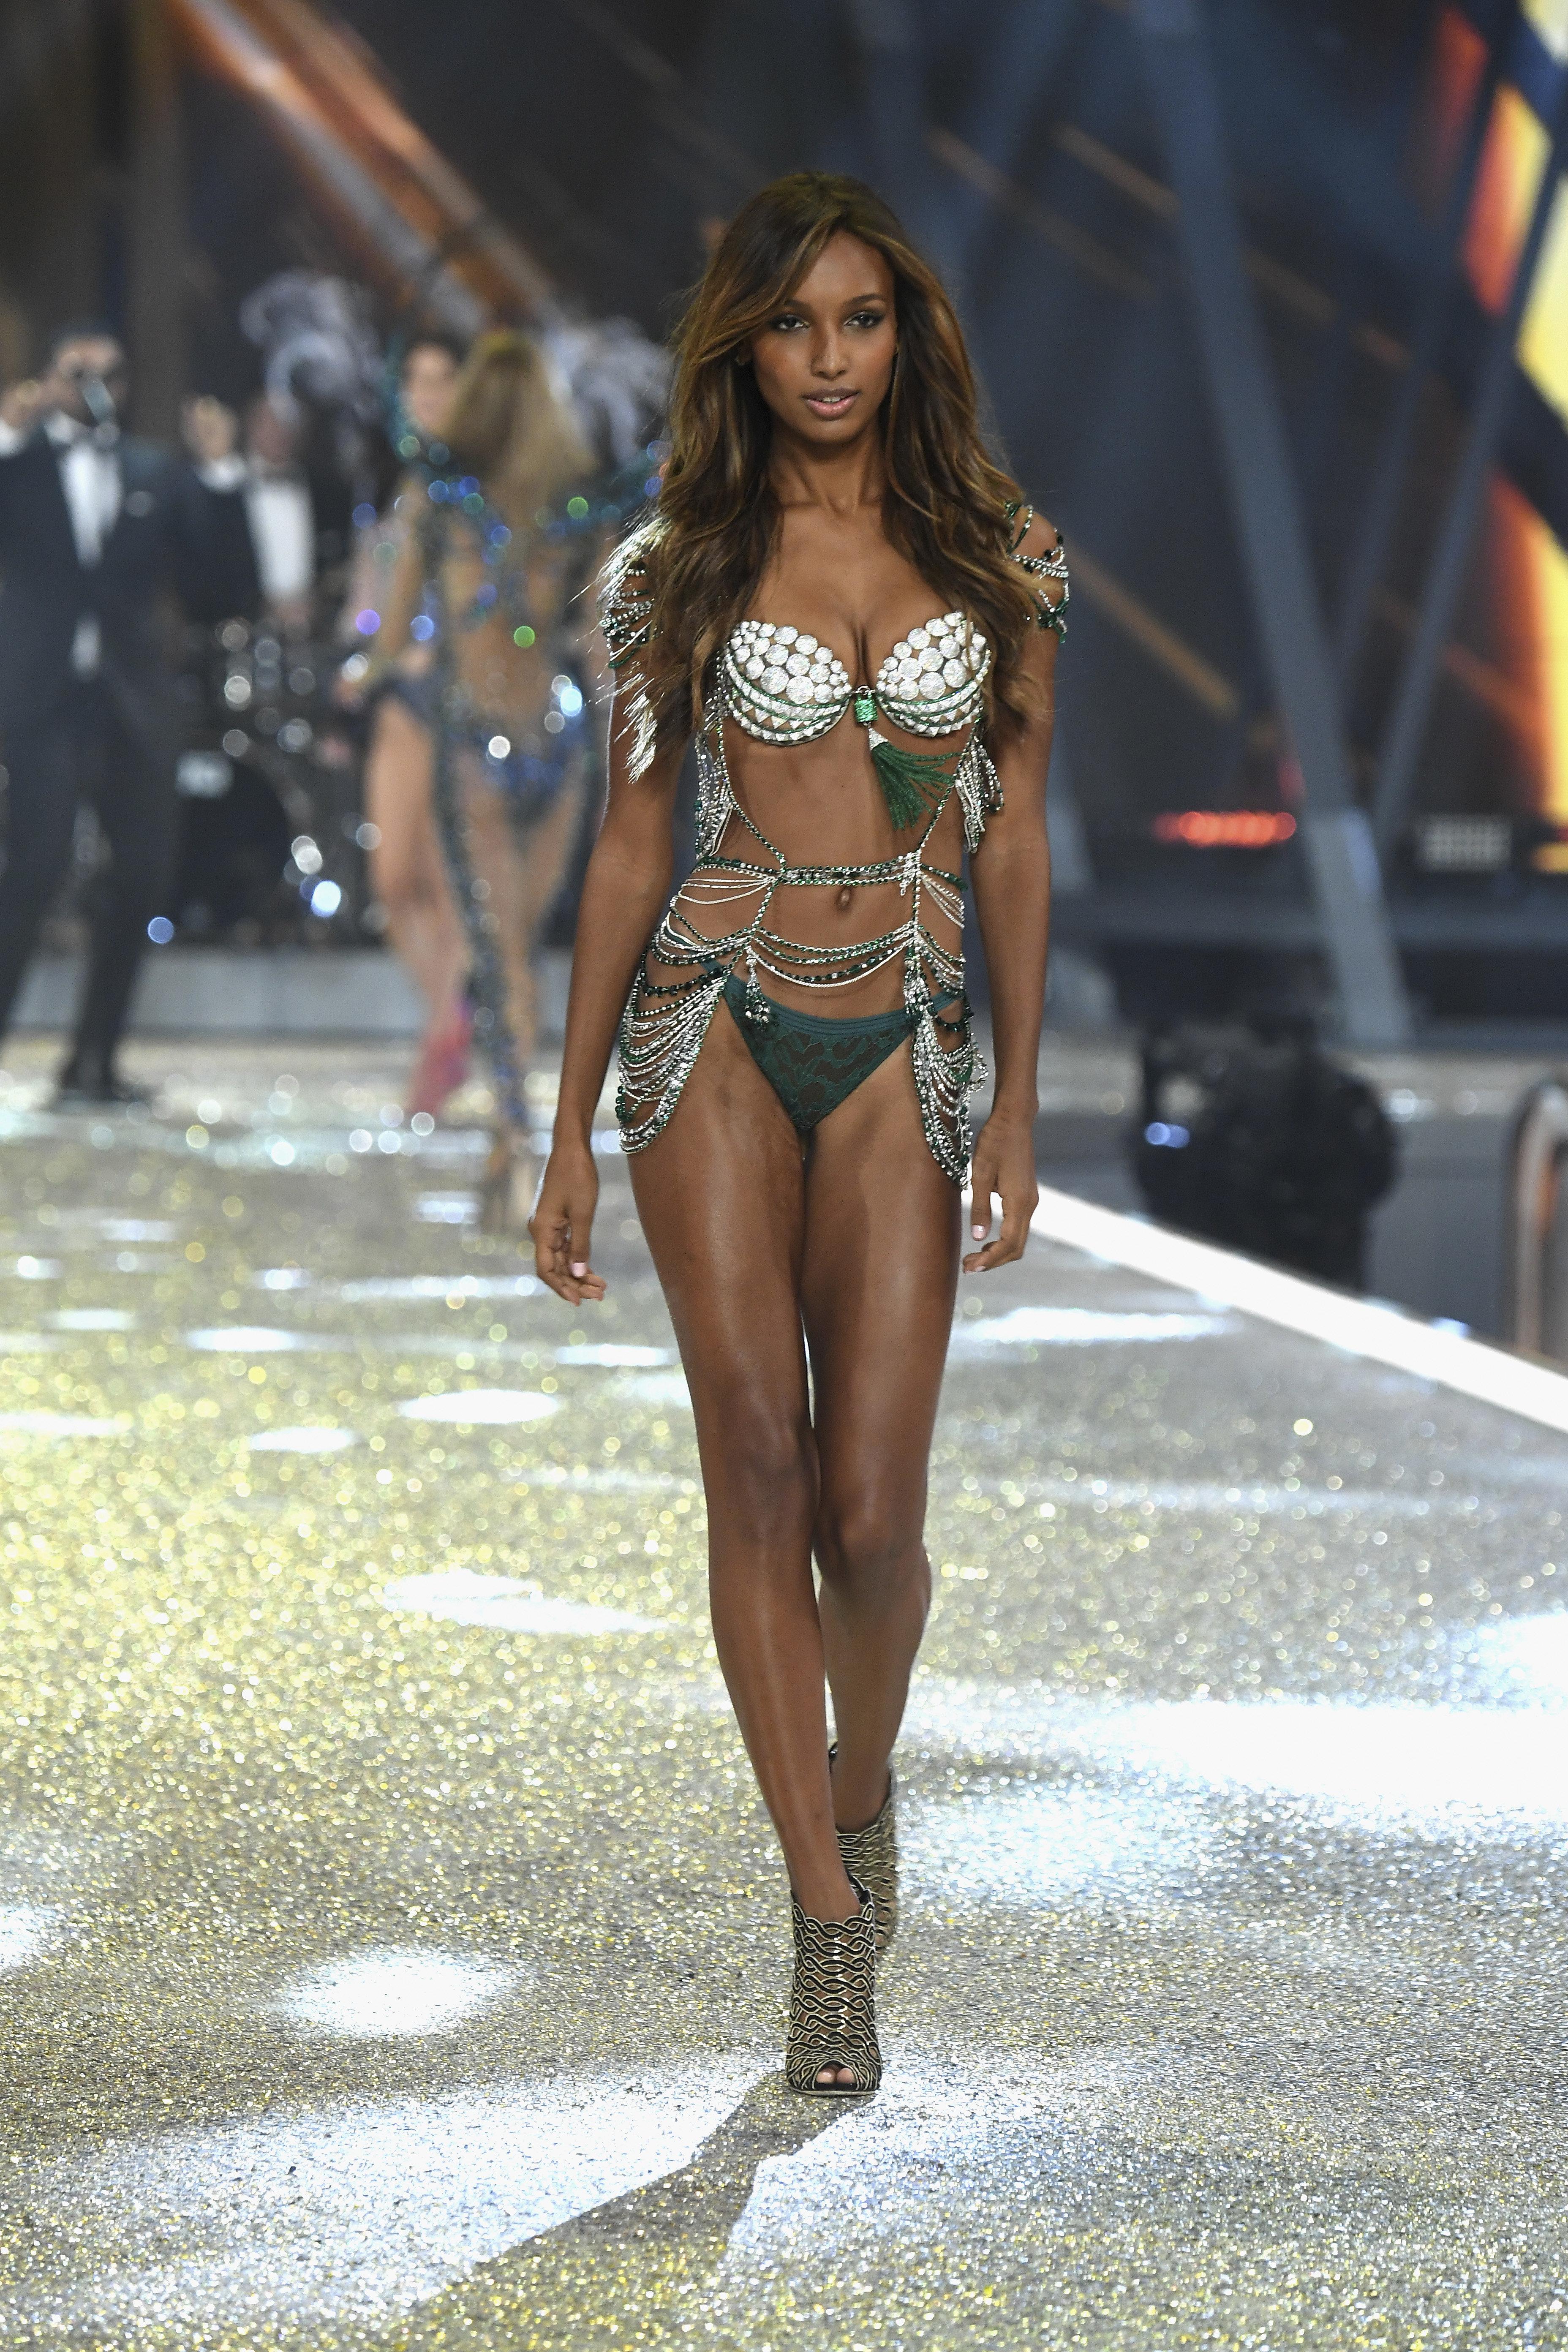 Jasmine Tookes wearing the fantasy bra.